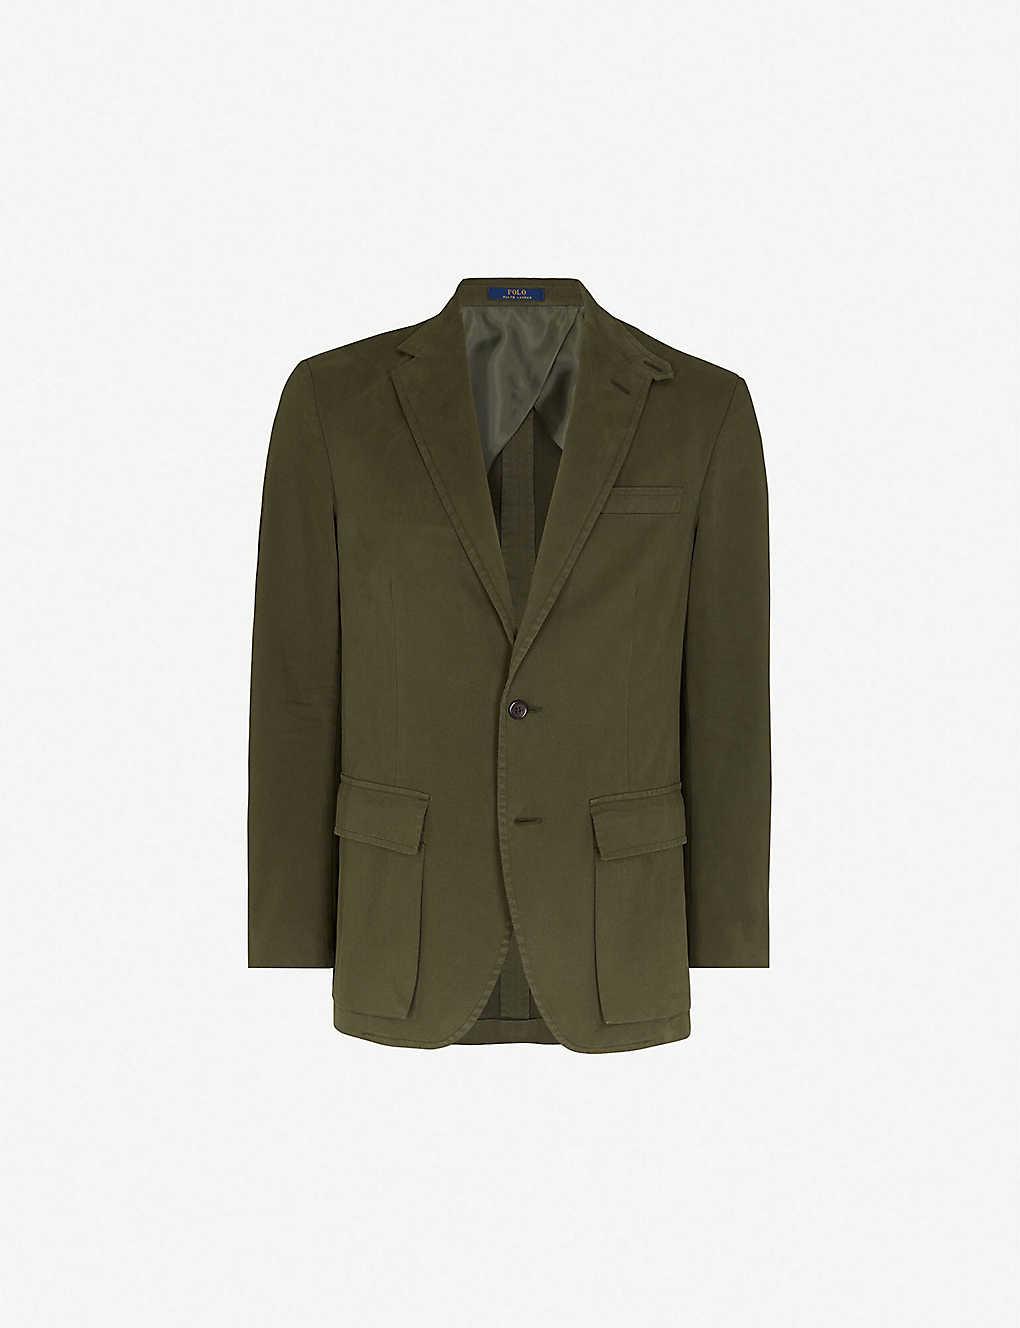 7504a1e4 POLO RALPH LAUREN - Single-breasted cotton blend jacket | Selfridges.com